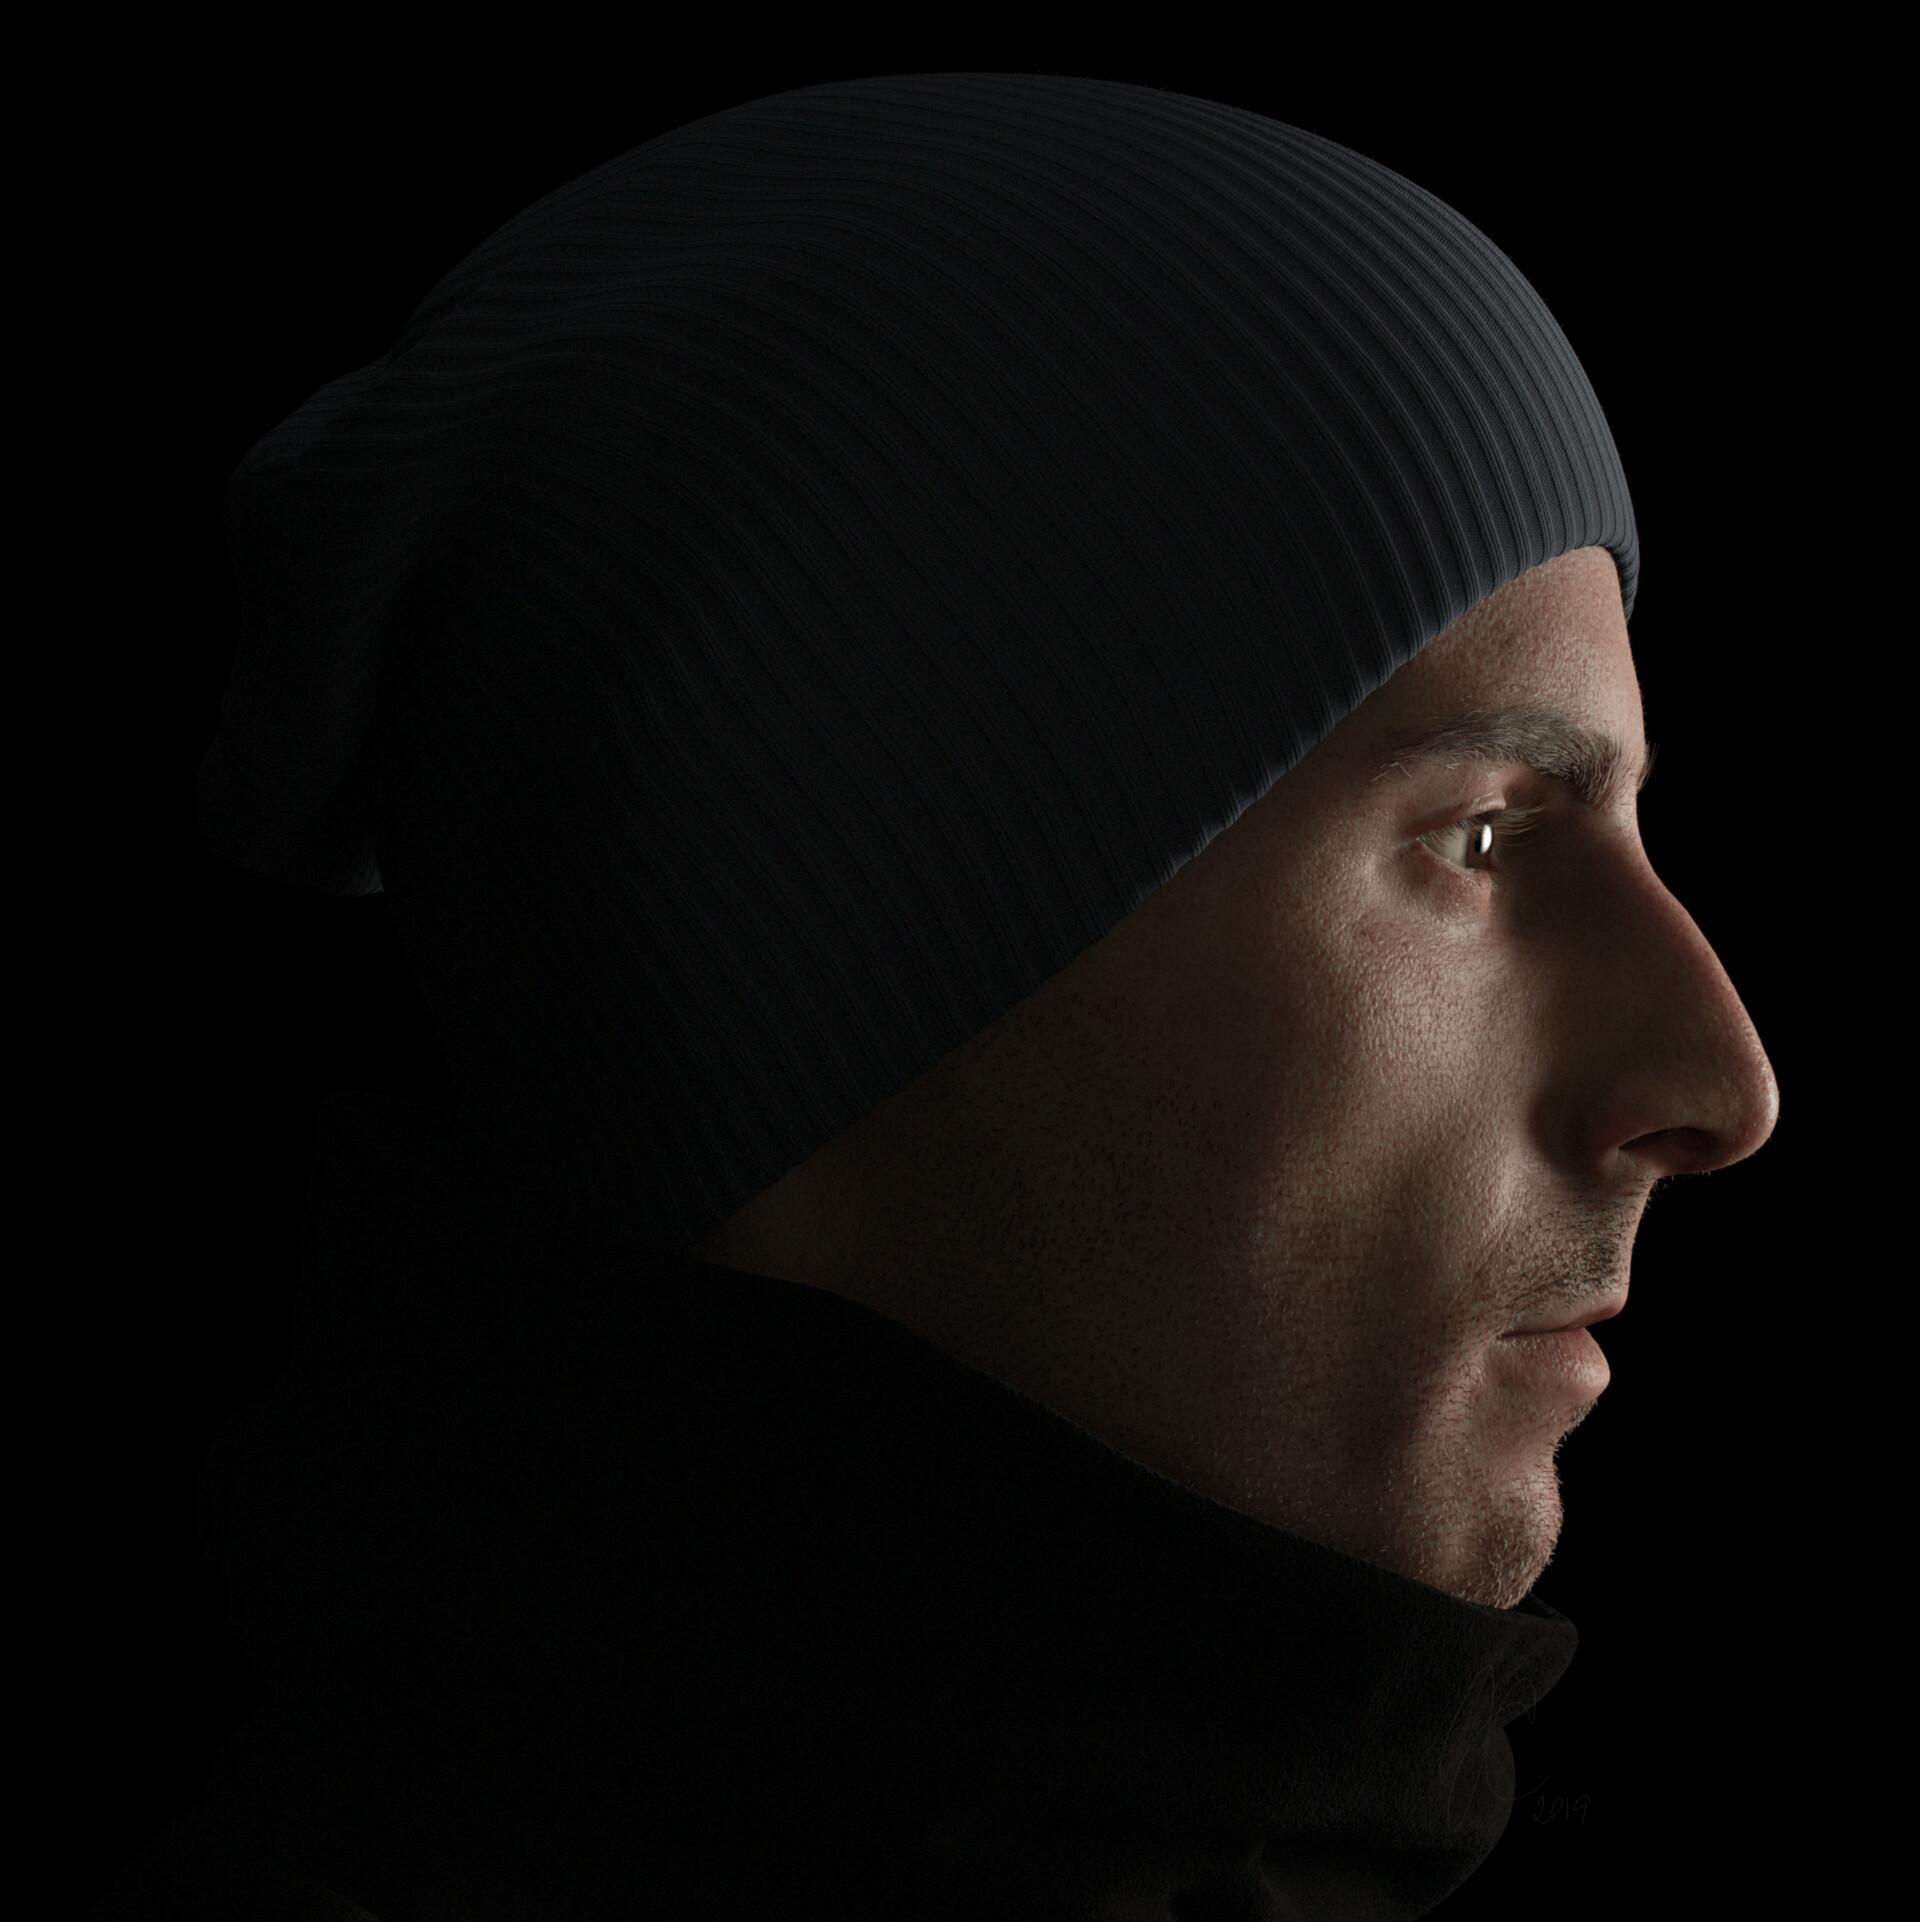 Jason colthrust digitalportrait by jasoncolthrust 8bitcrop